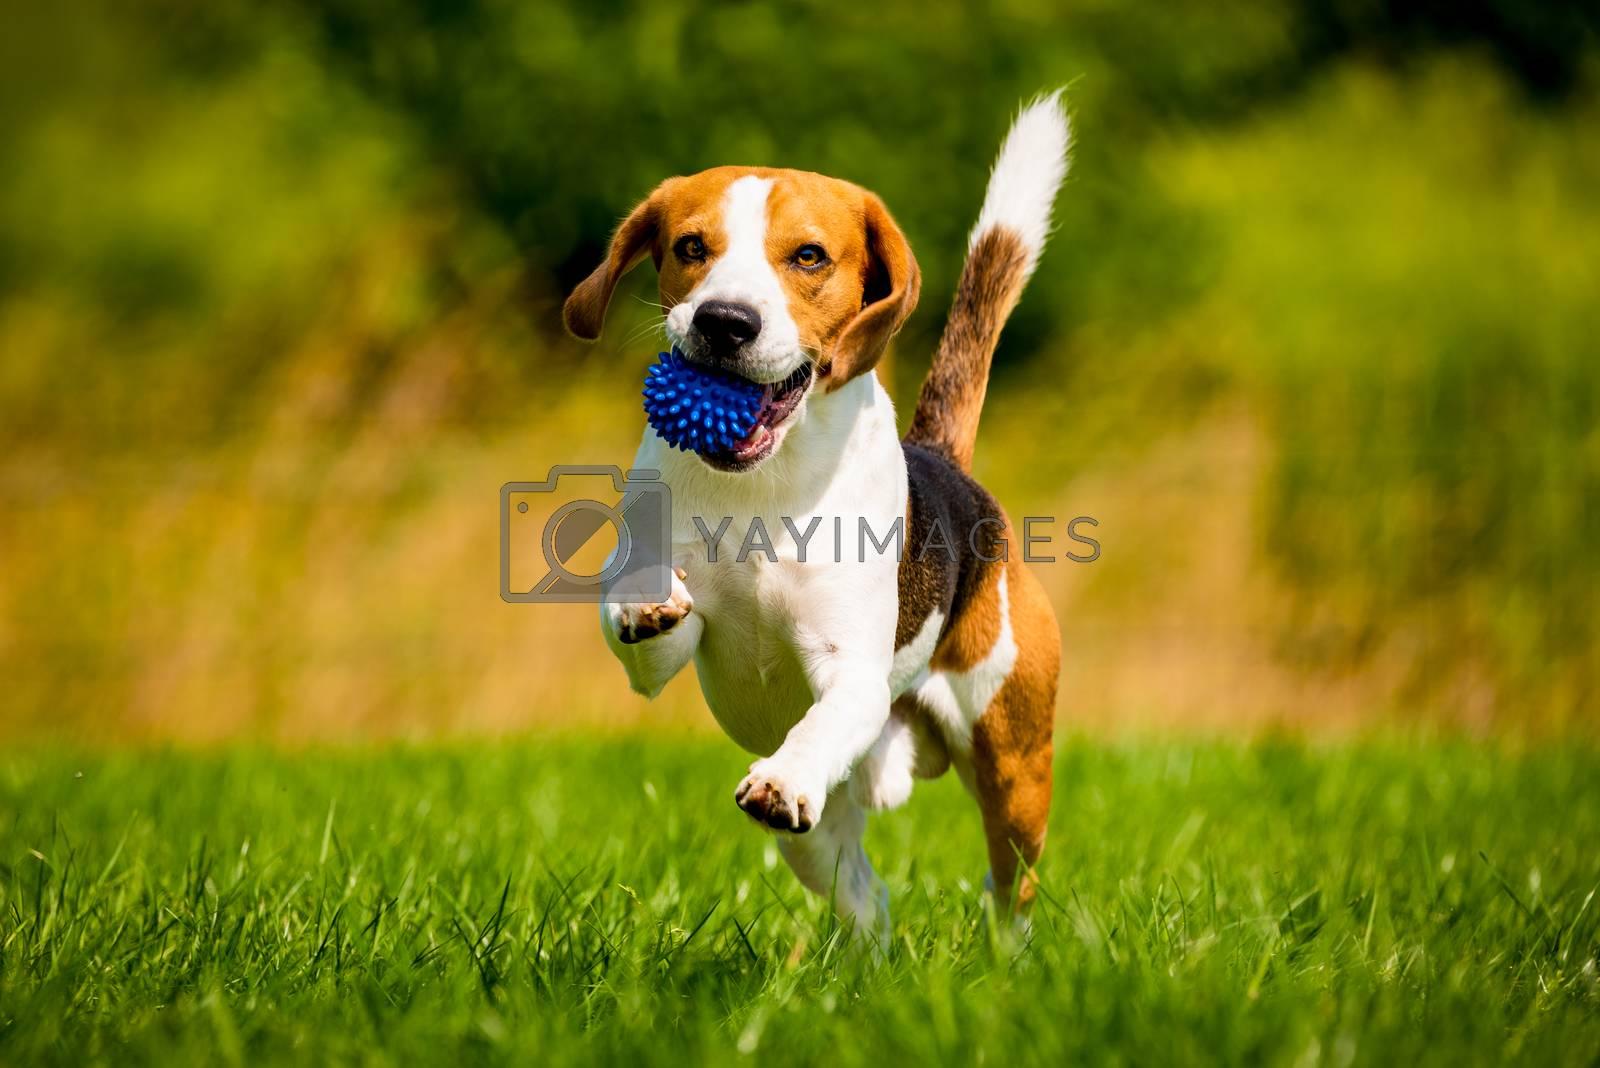 Beagle dog fun in garden outdoors run and jump with ball towards camera. Dog background.